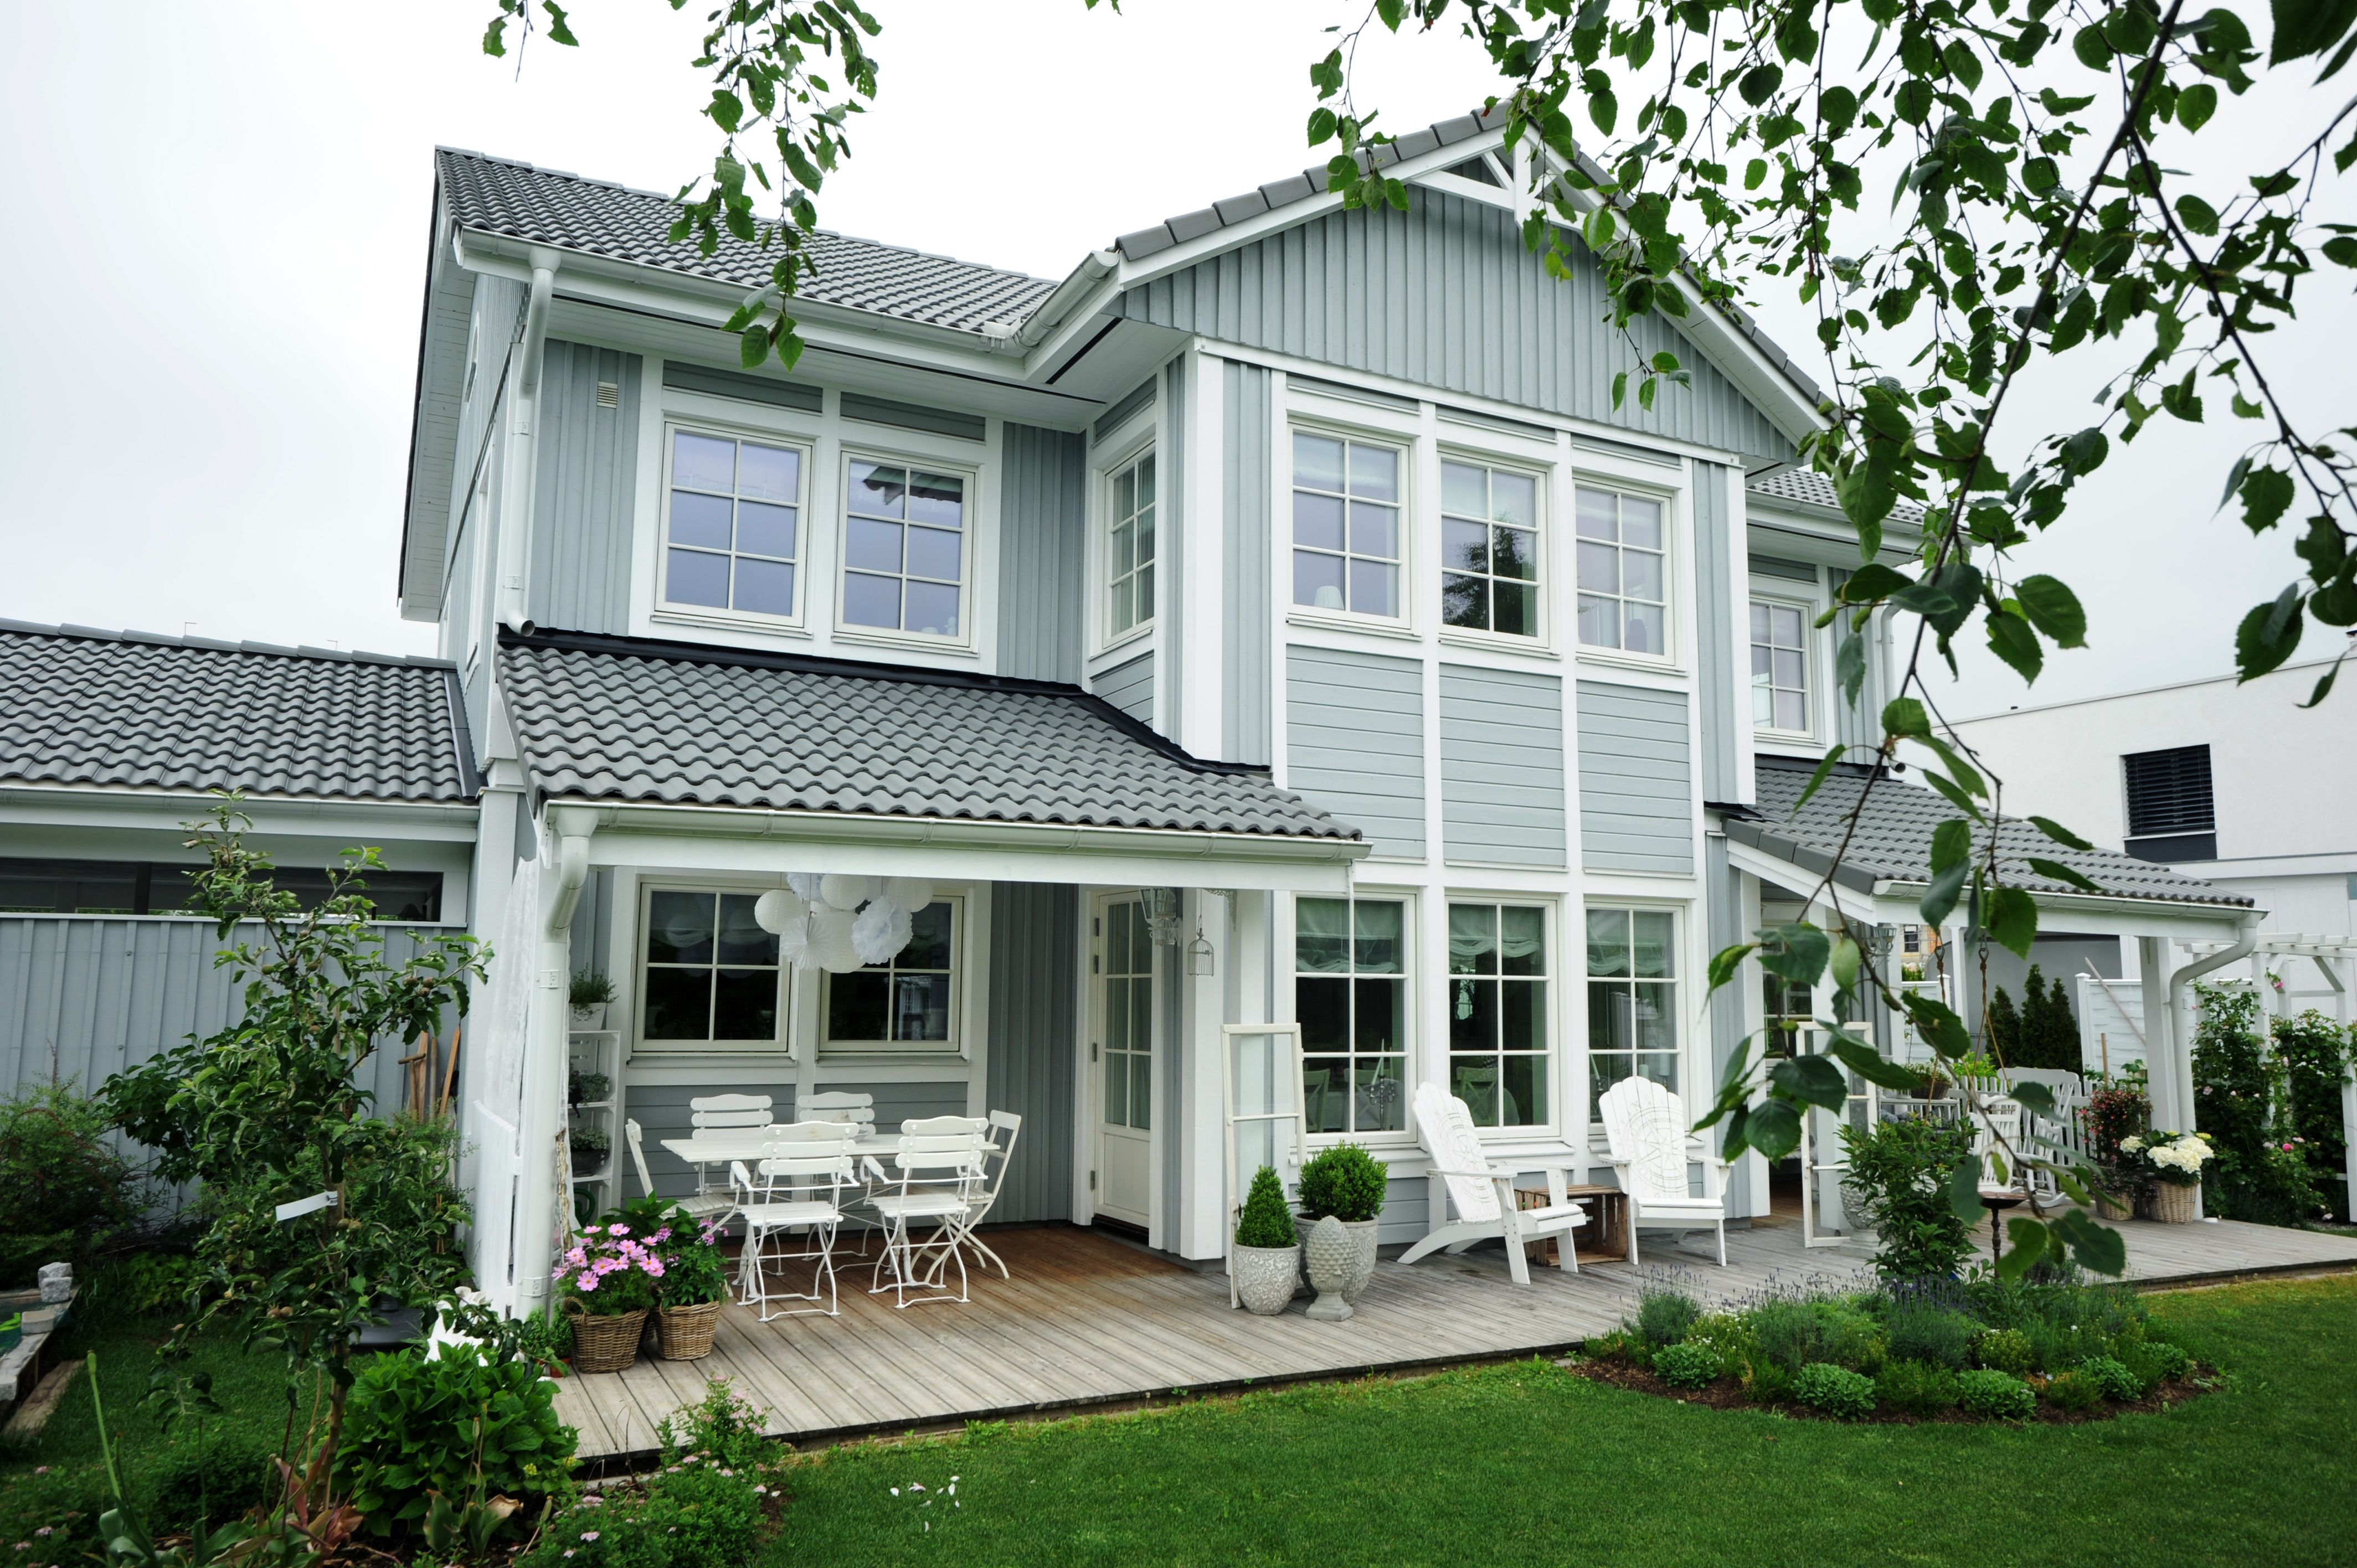 Pin von timberhaus auf timberhaus haus haus ideen und schwedisches haus - Skandinavisches gartenhaus ...